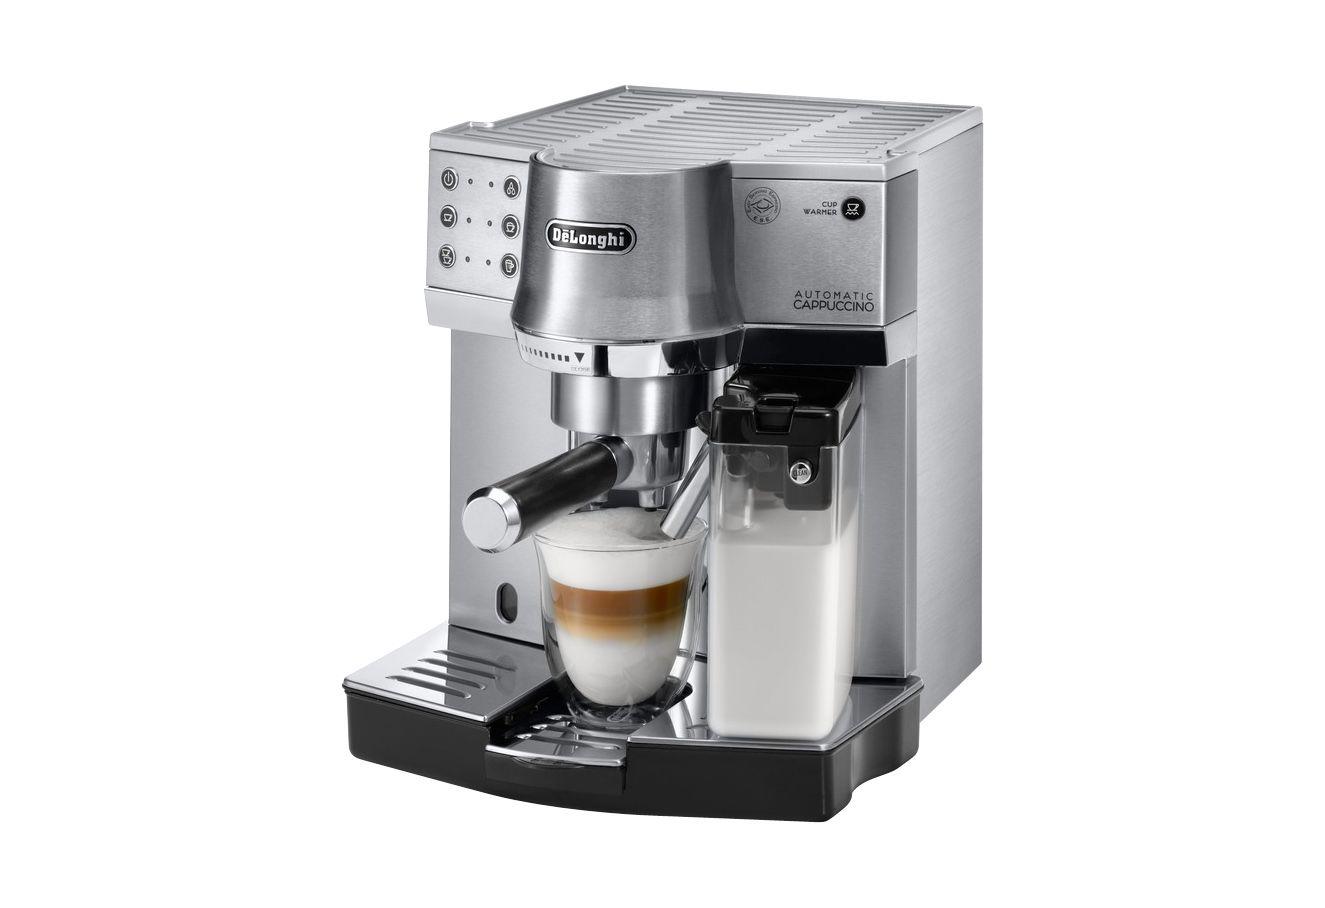 de longhi siebtr ger ec 860 m pumpendruck 15 bar schwab versand espressomaschinen. Black Bedroom Furniture Sets. Home Design Ideas